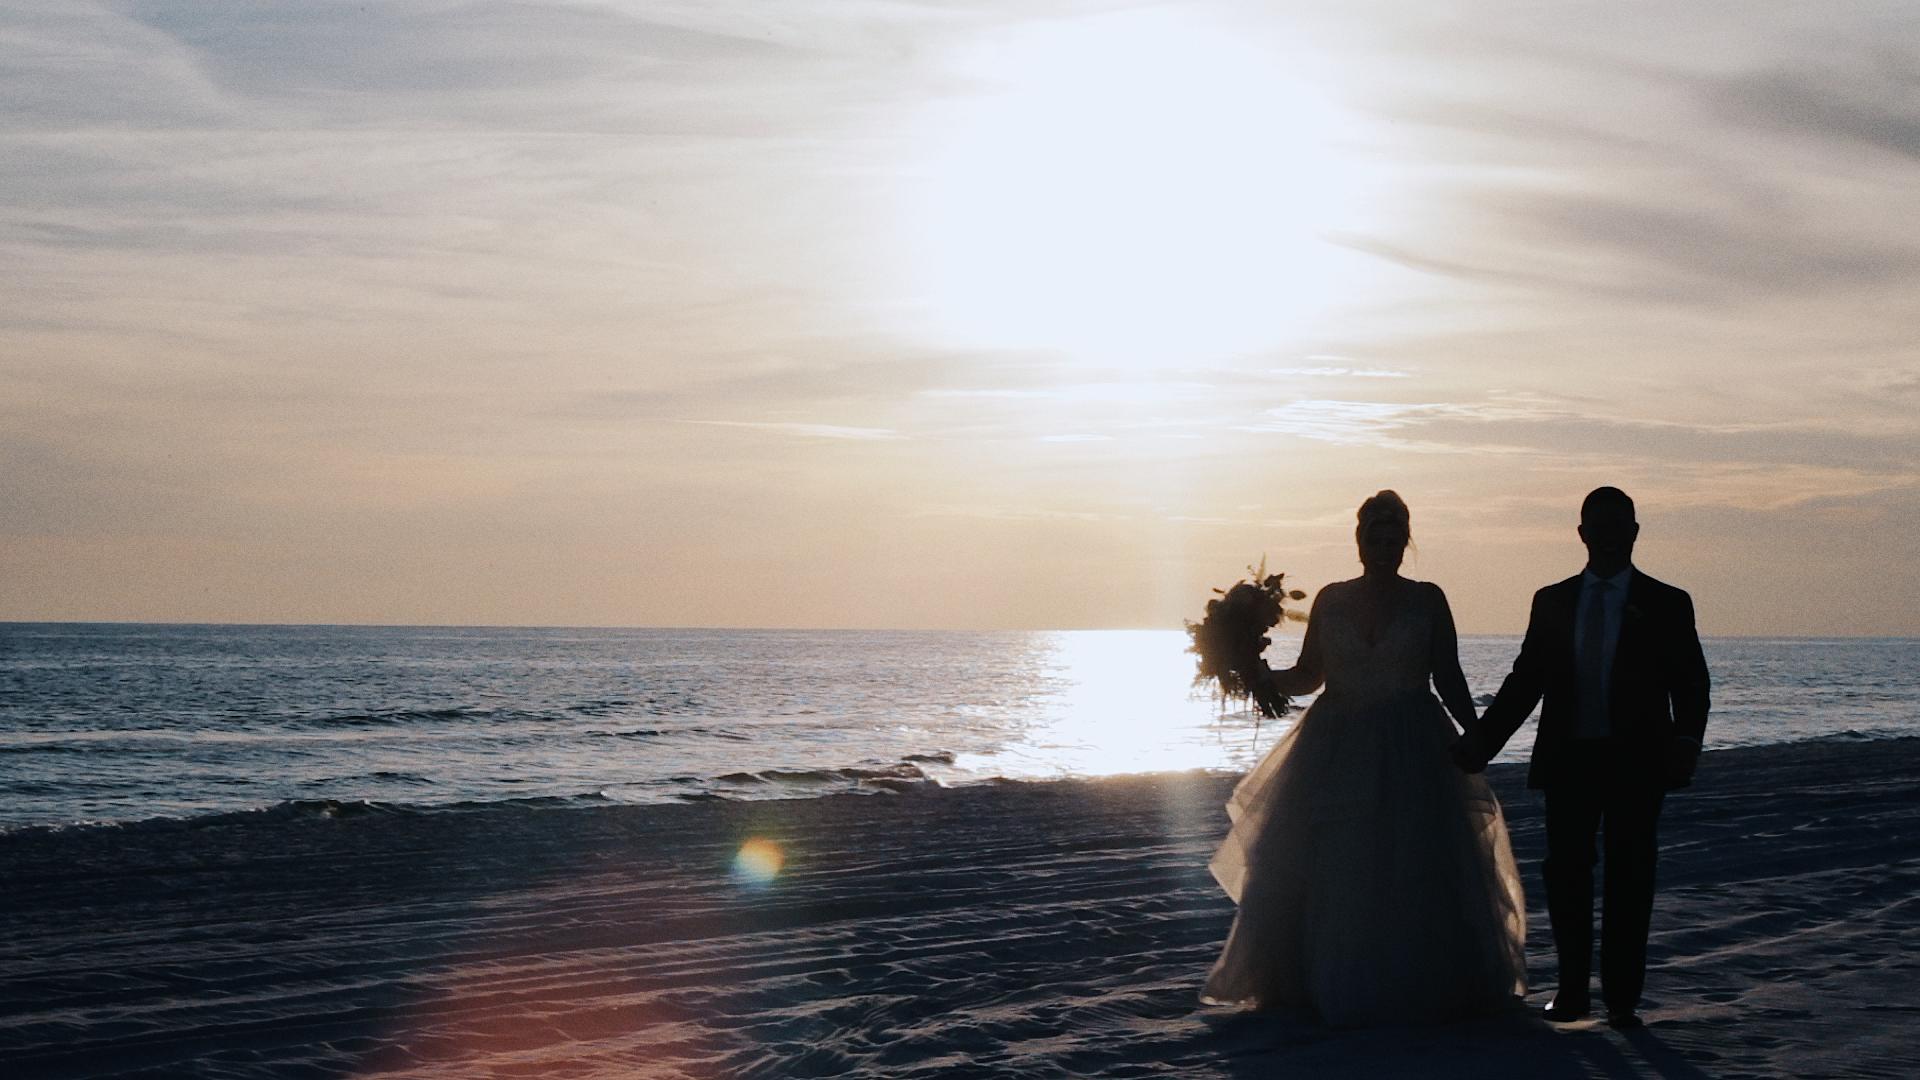 Jason & Ashlee had a captivating, intimate wedding at a beach house in Santa Rosa Beach, Florida